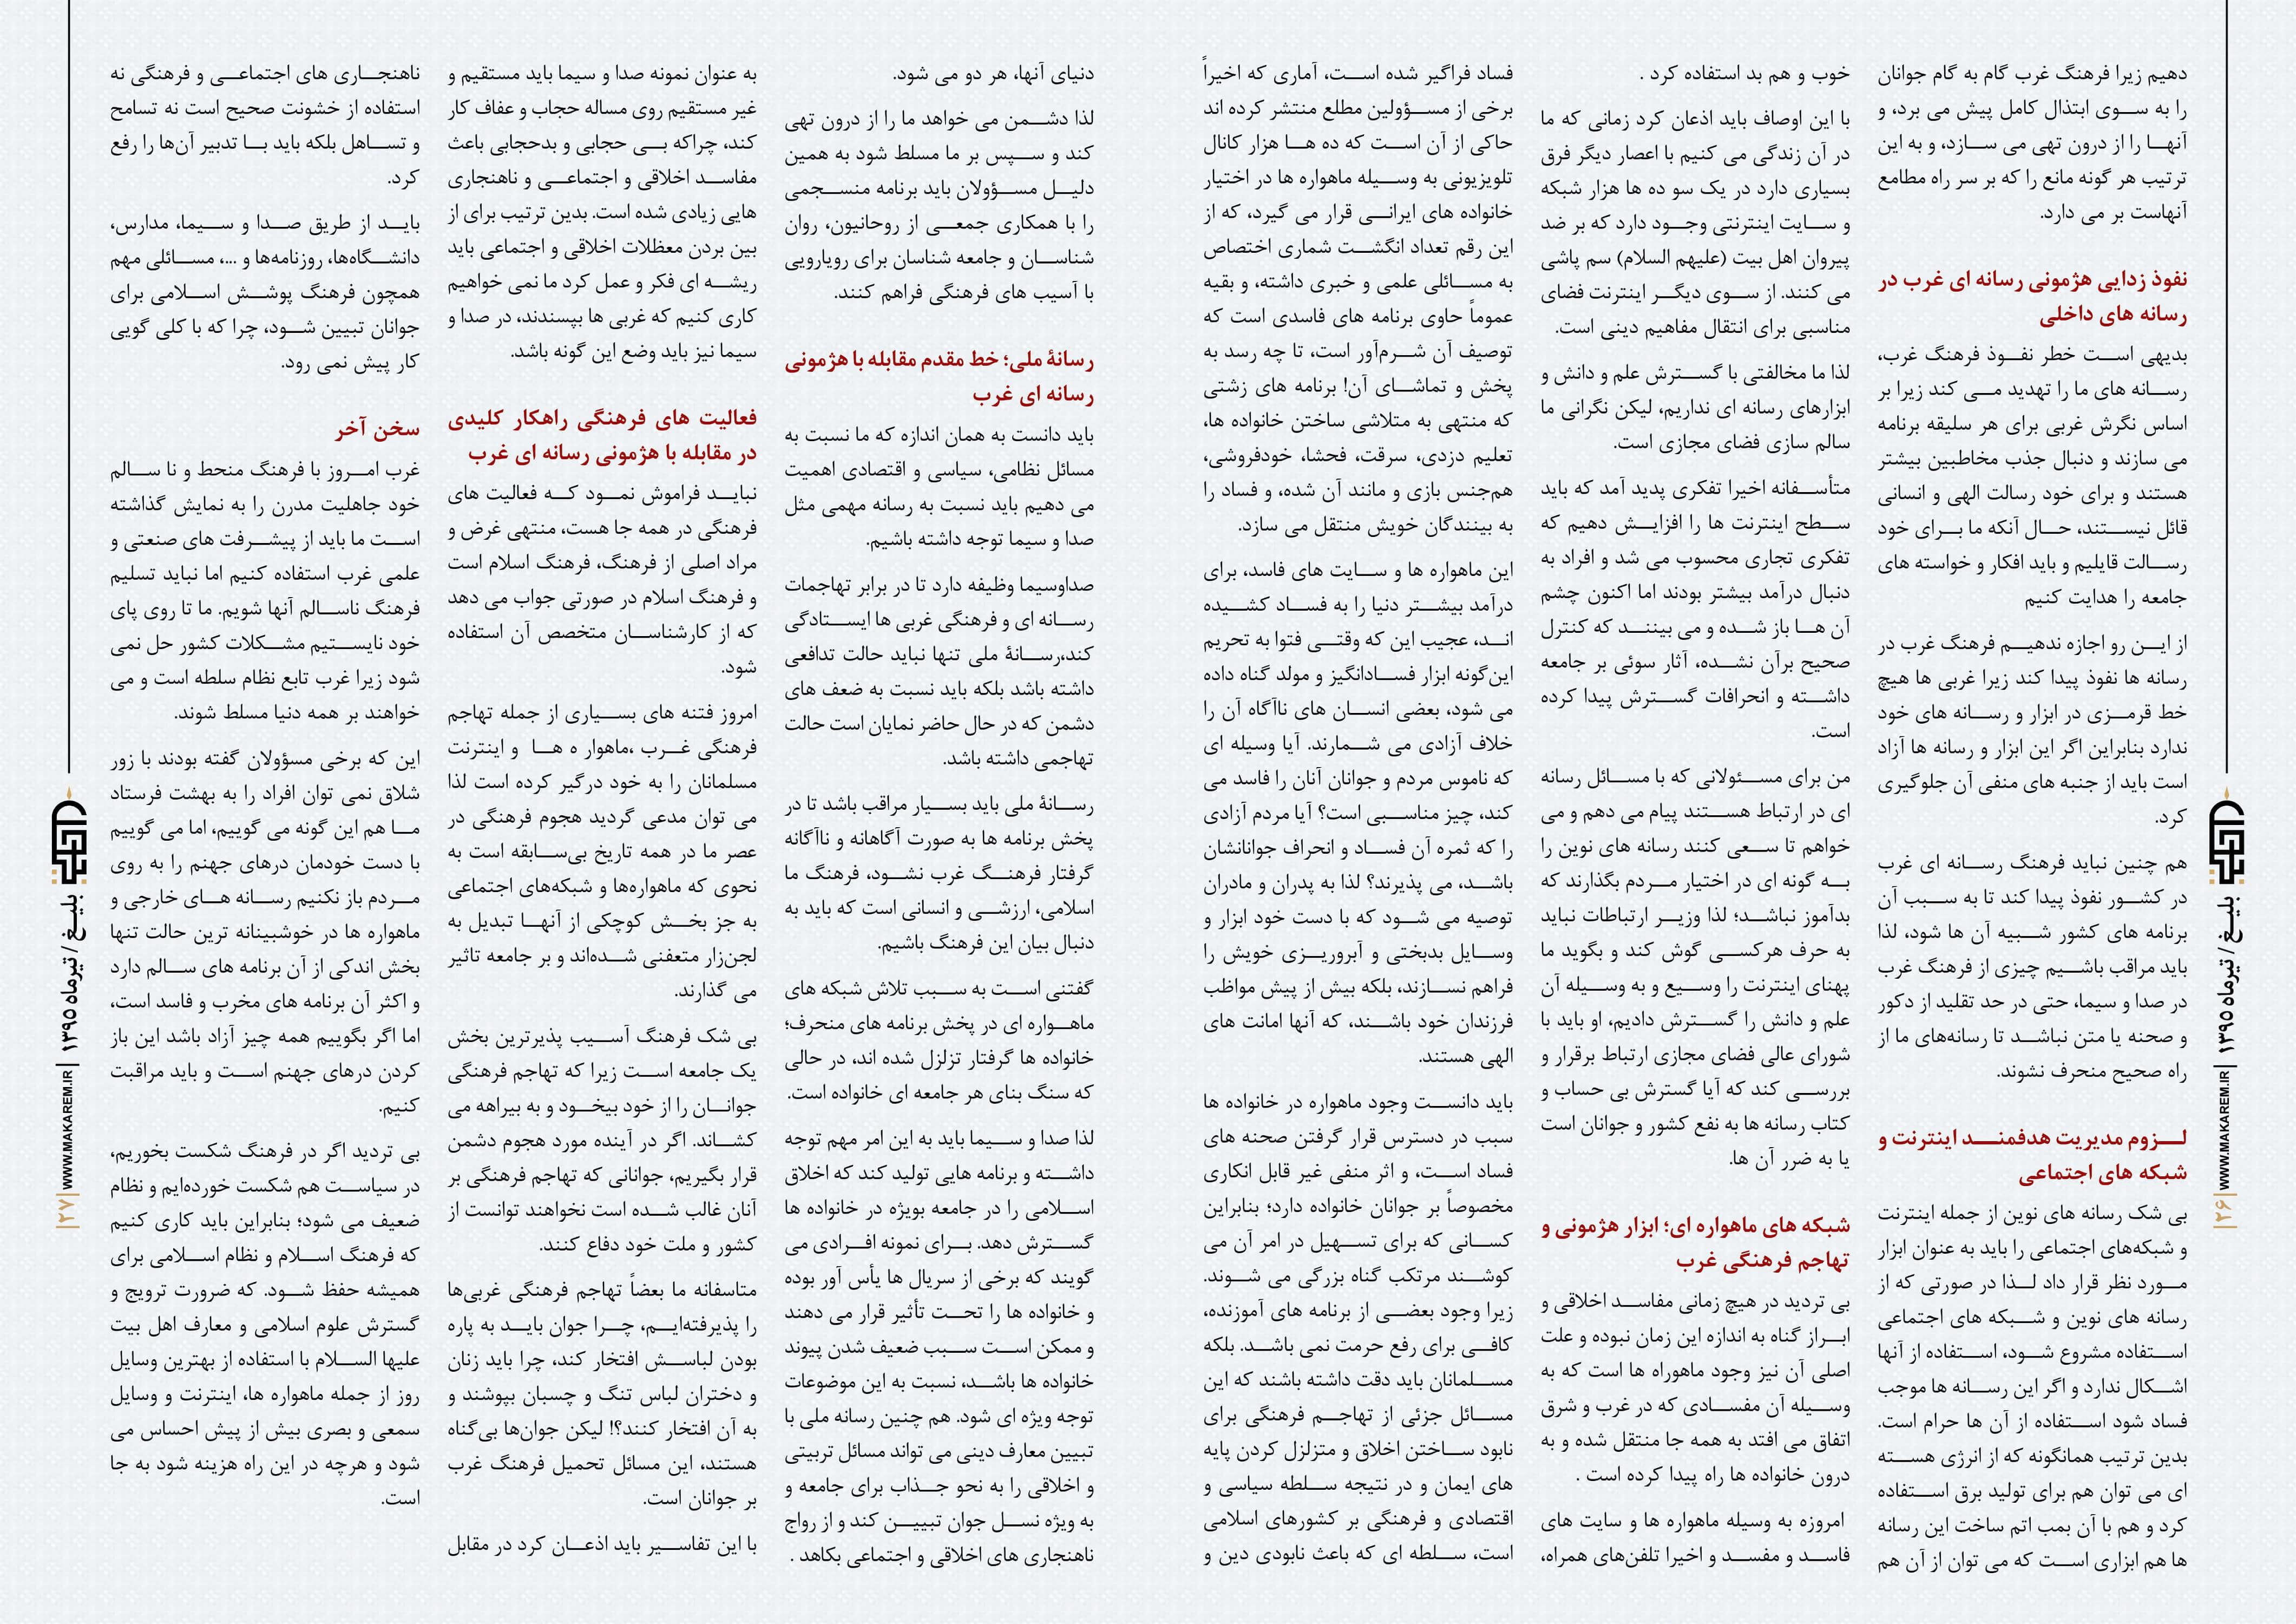 بلیغ 14-مدرسه الامام امیر المومنین (ع)